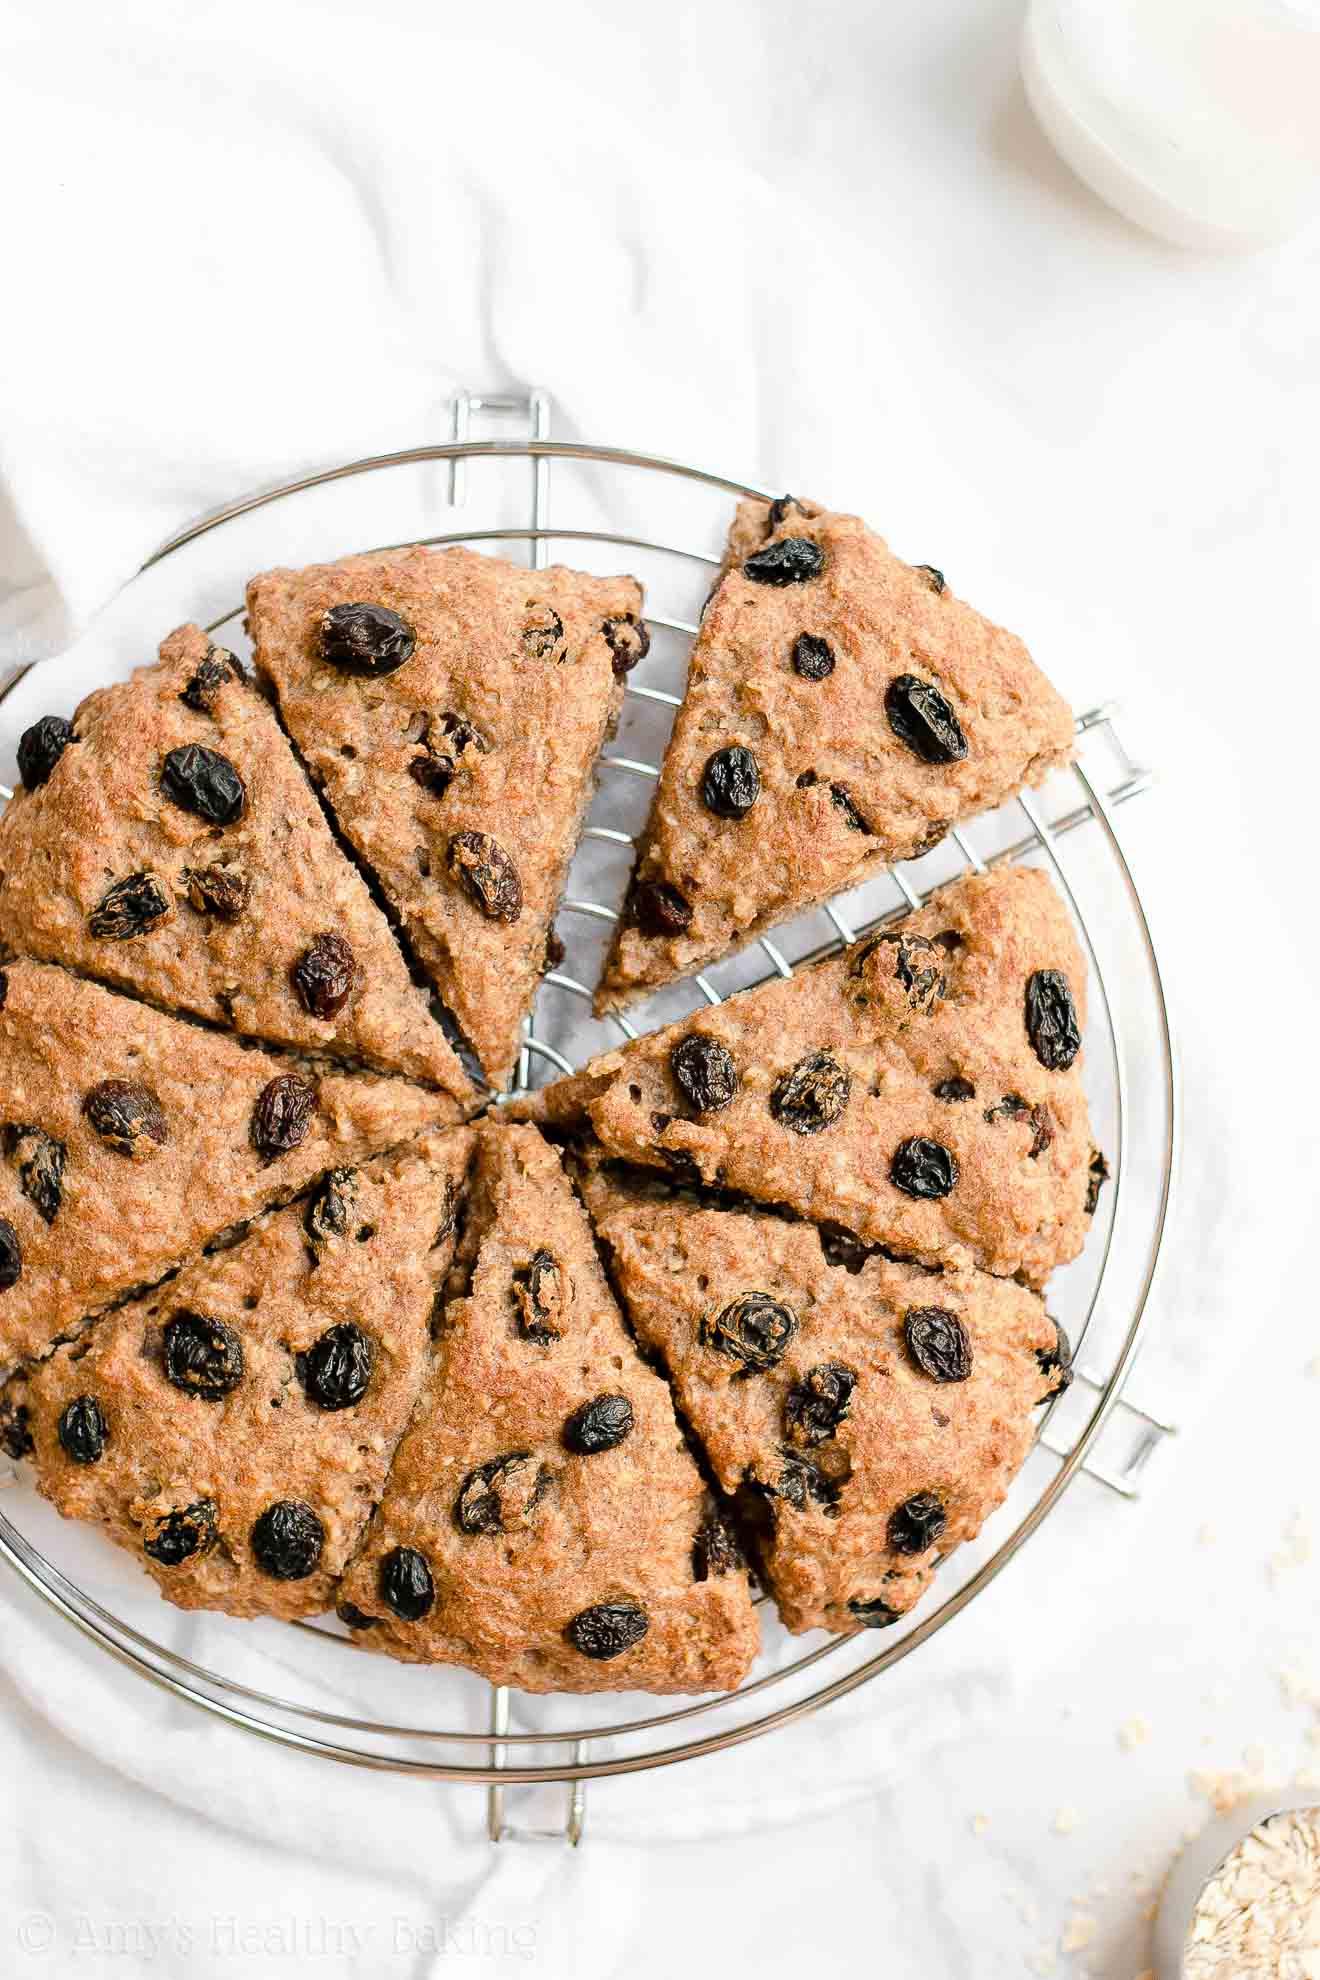 Healthy Low Fat Whole Wheat Oatmeal Raisin Scones